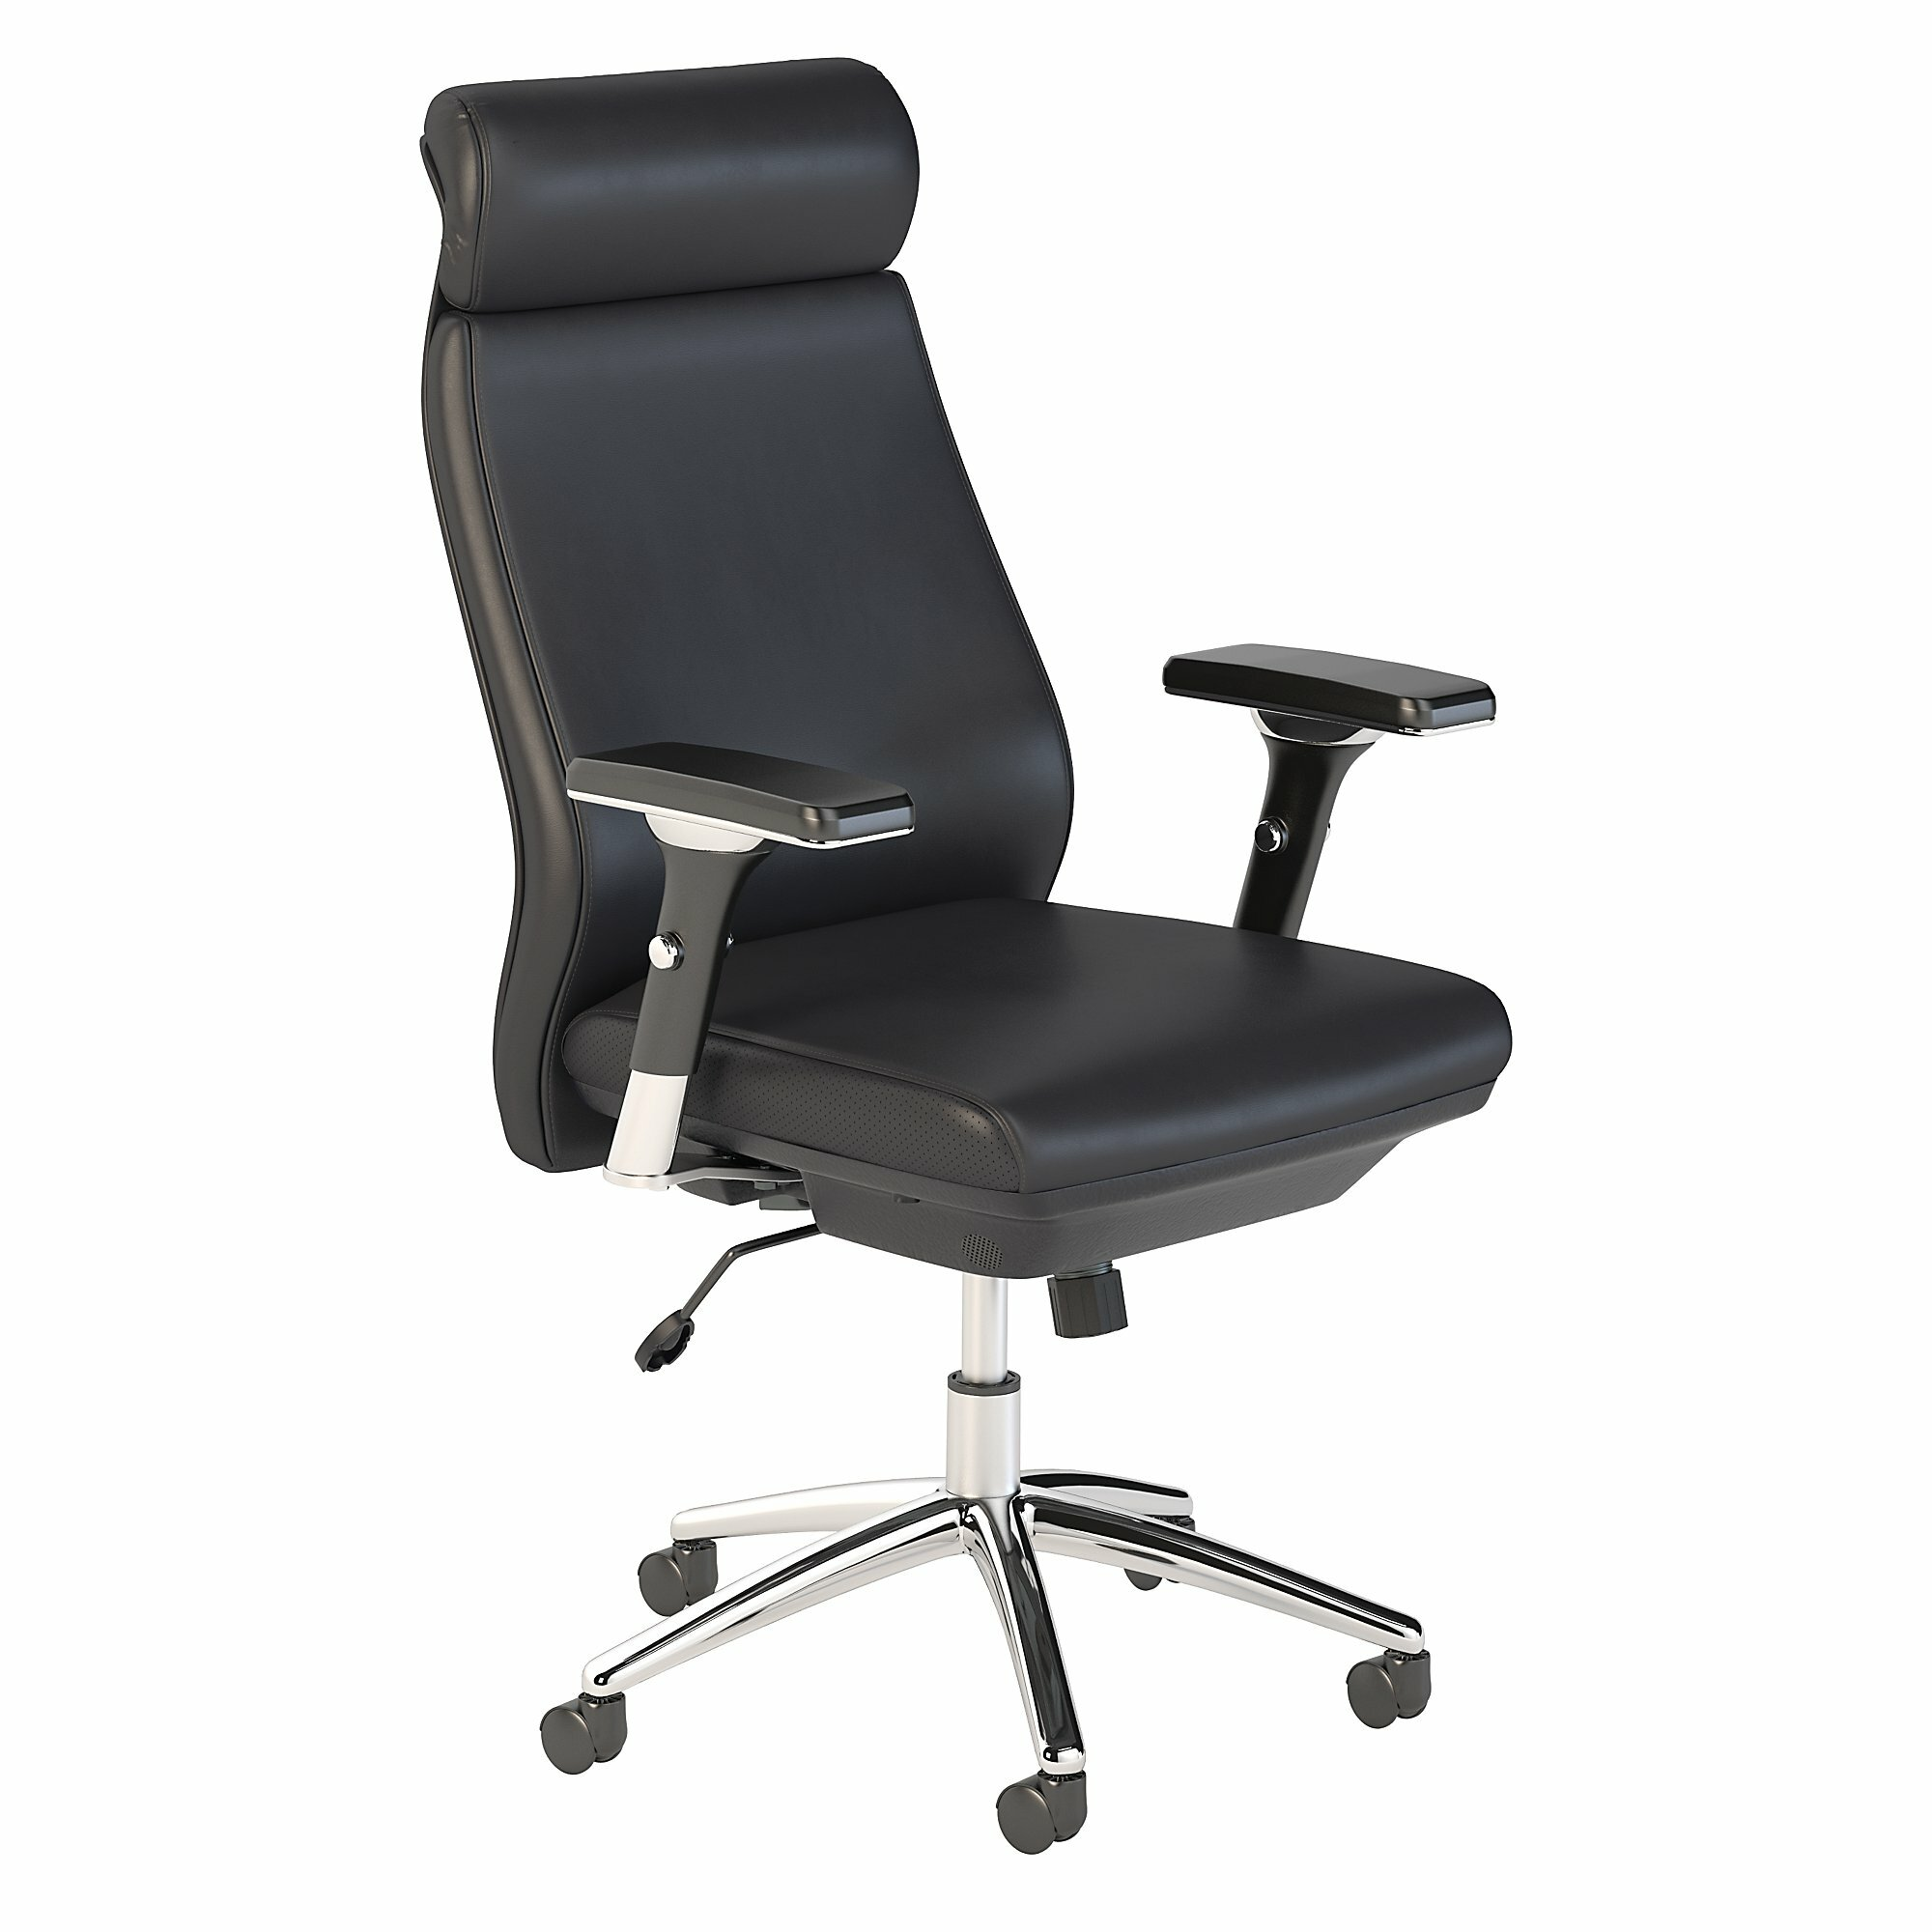 Bush Business Furniture Studio C High Back Ergonomic Executive Chair Reviews Wayfair